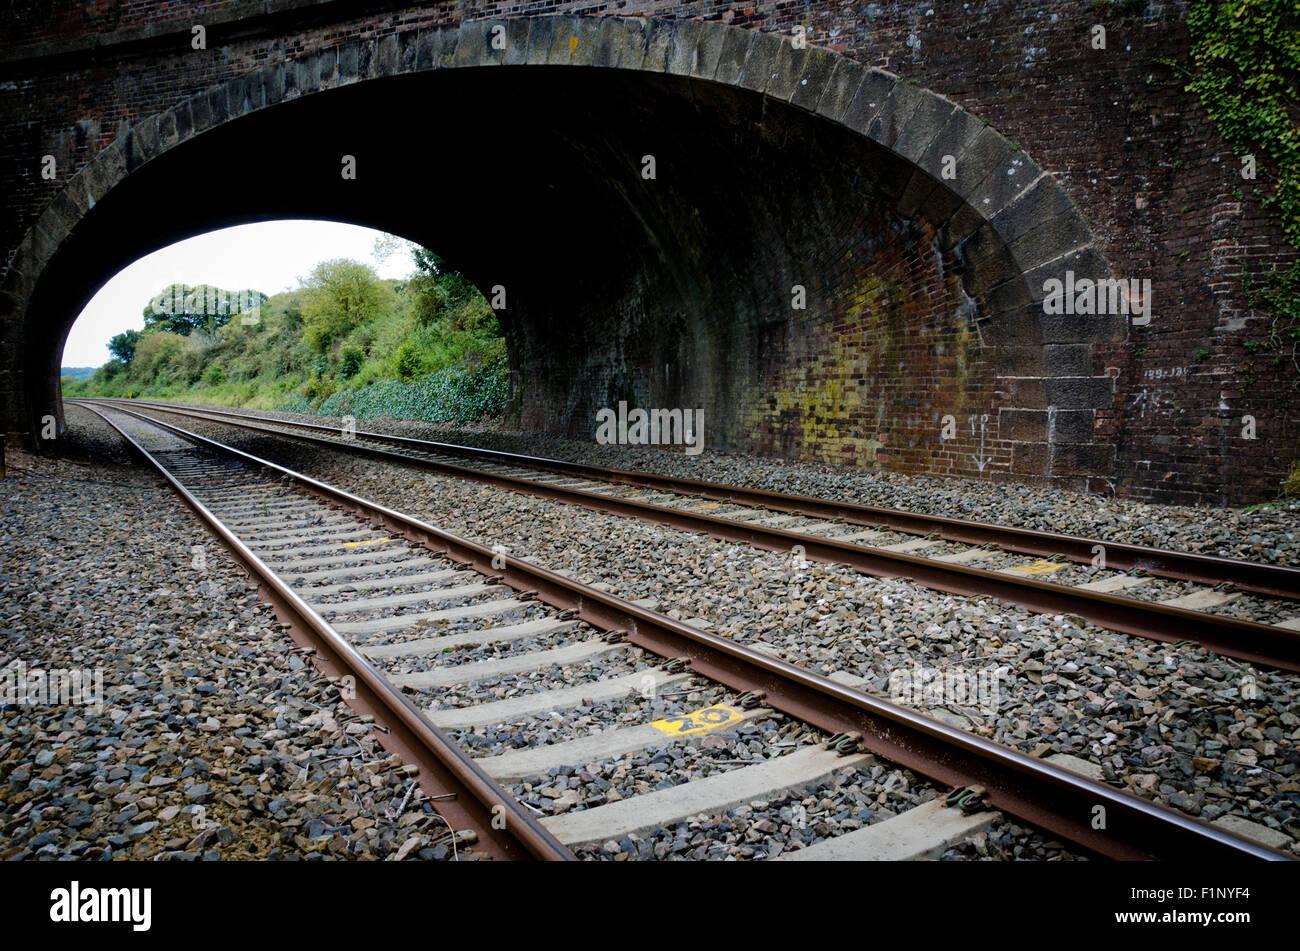 Railway rail tracks under bridge - Stock Image